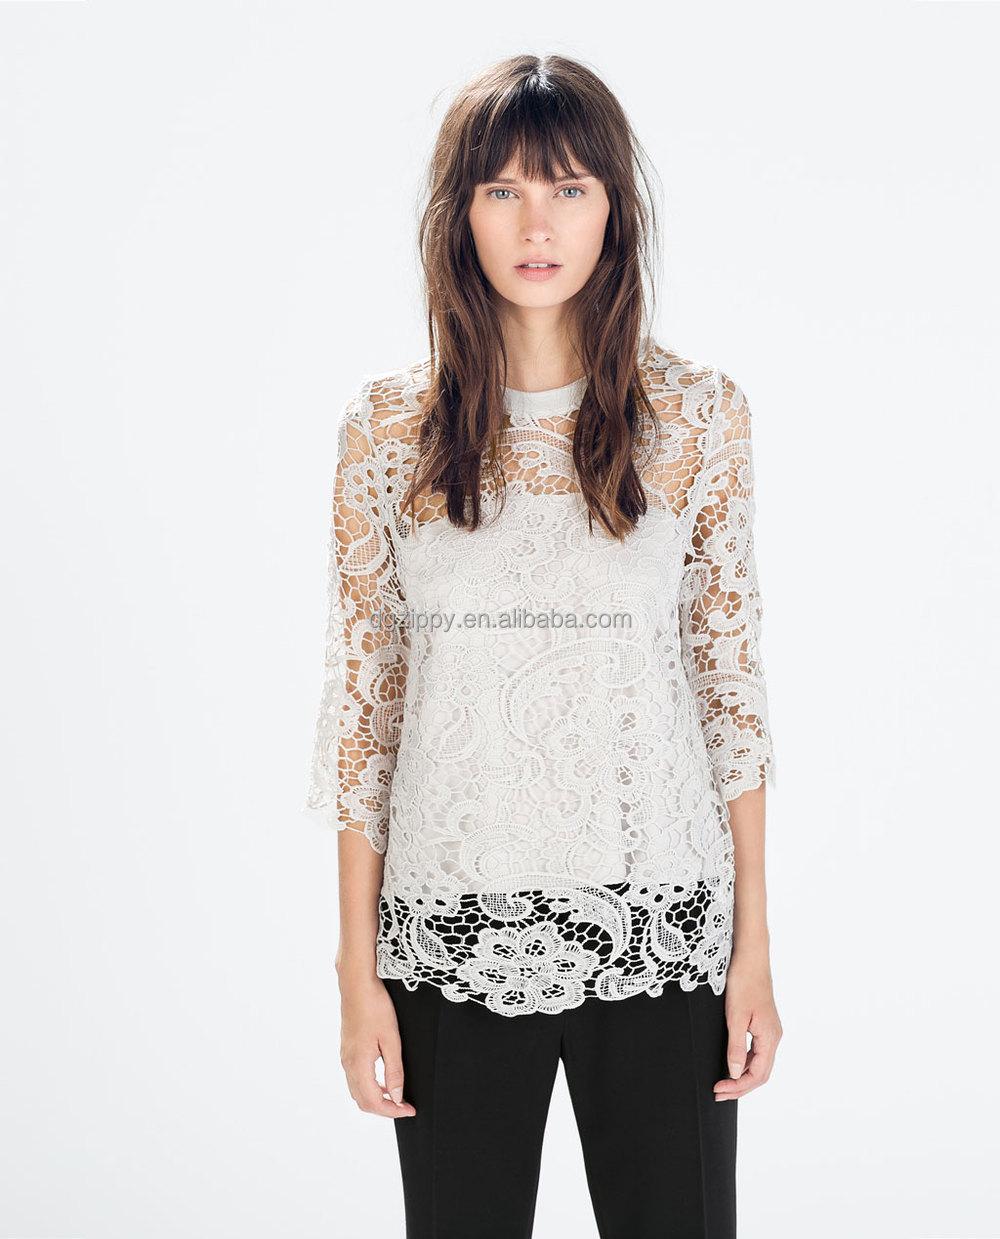 Women Lace Blouse Long Sleeve Lace Tops & Women Lace Tops